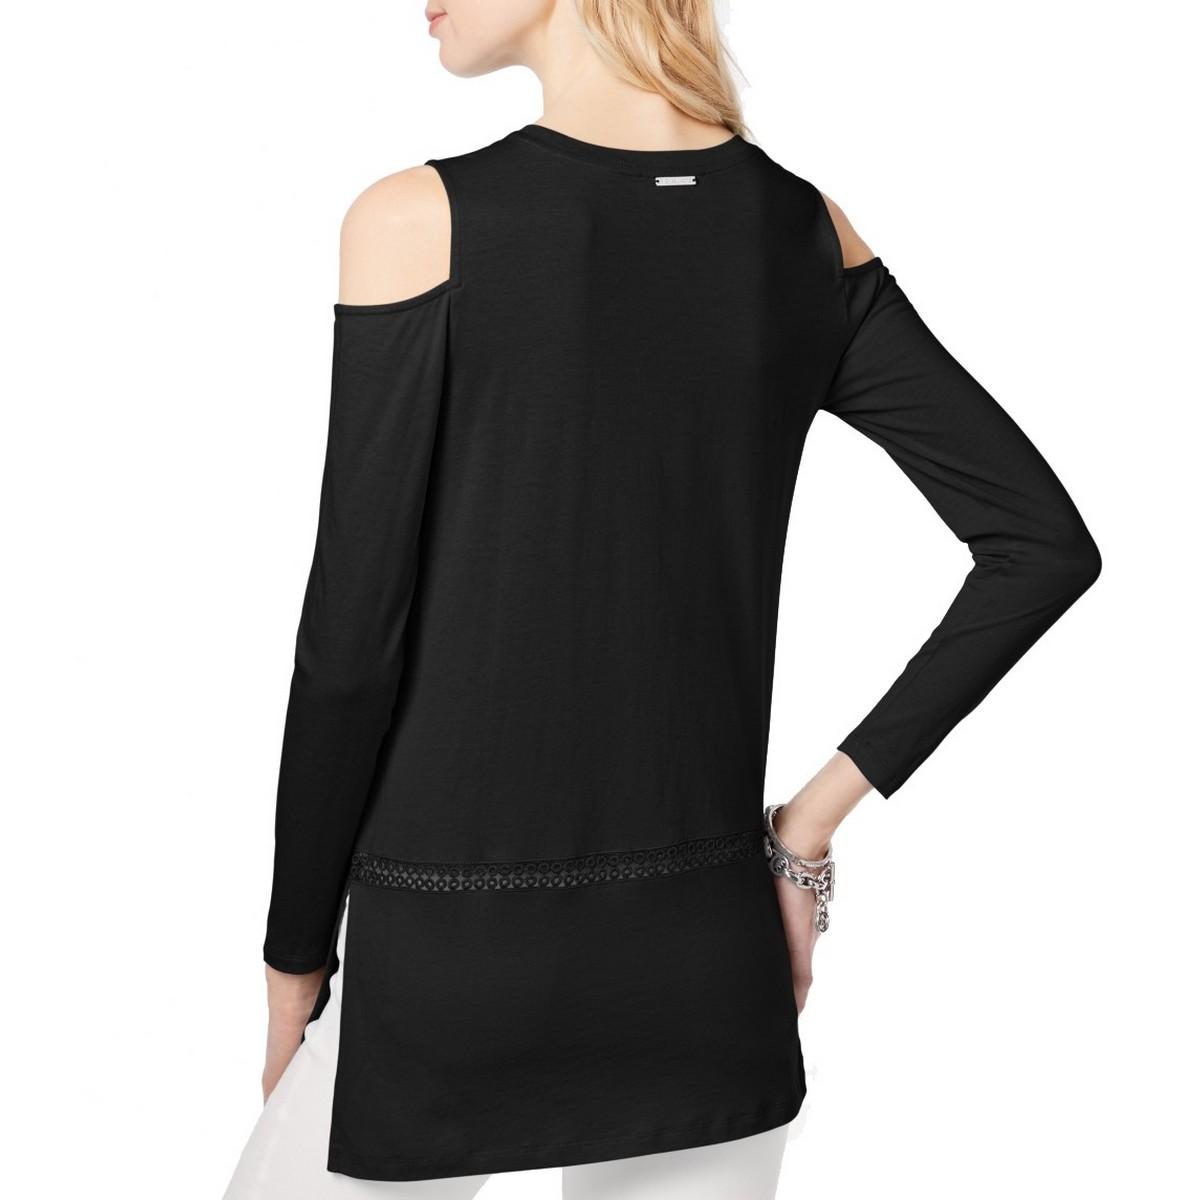 MICHAEL-KORS-NEW-Women-039-s-Turquoise-Cold-shoulder-Casual-Shirt-Top-XS-TEDO thumbnail 4